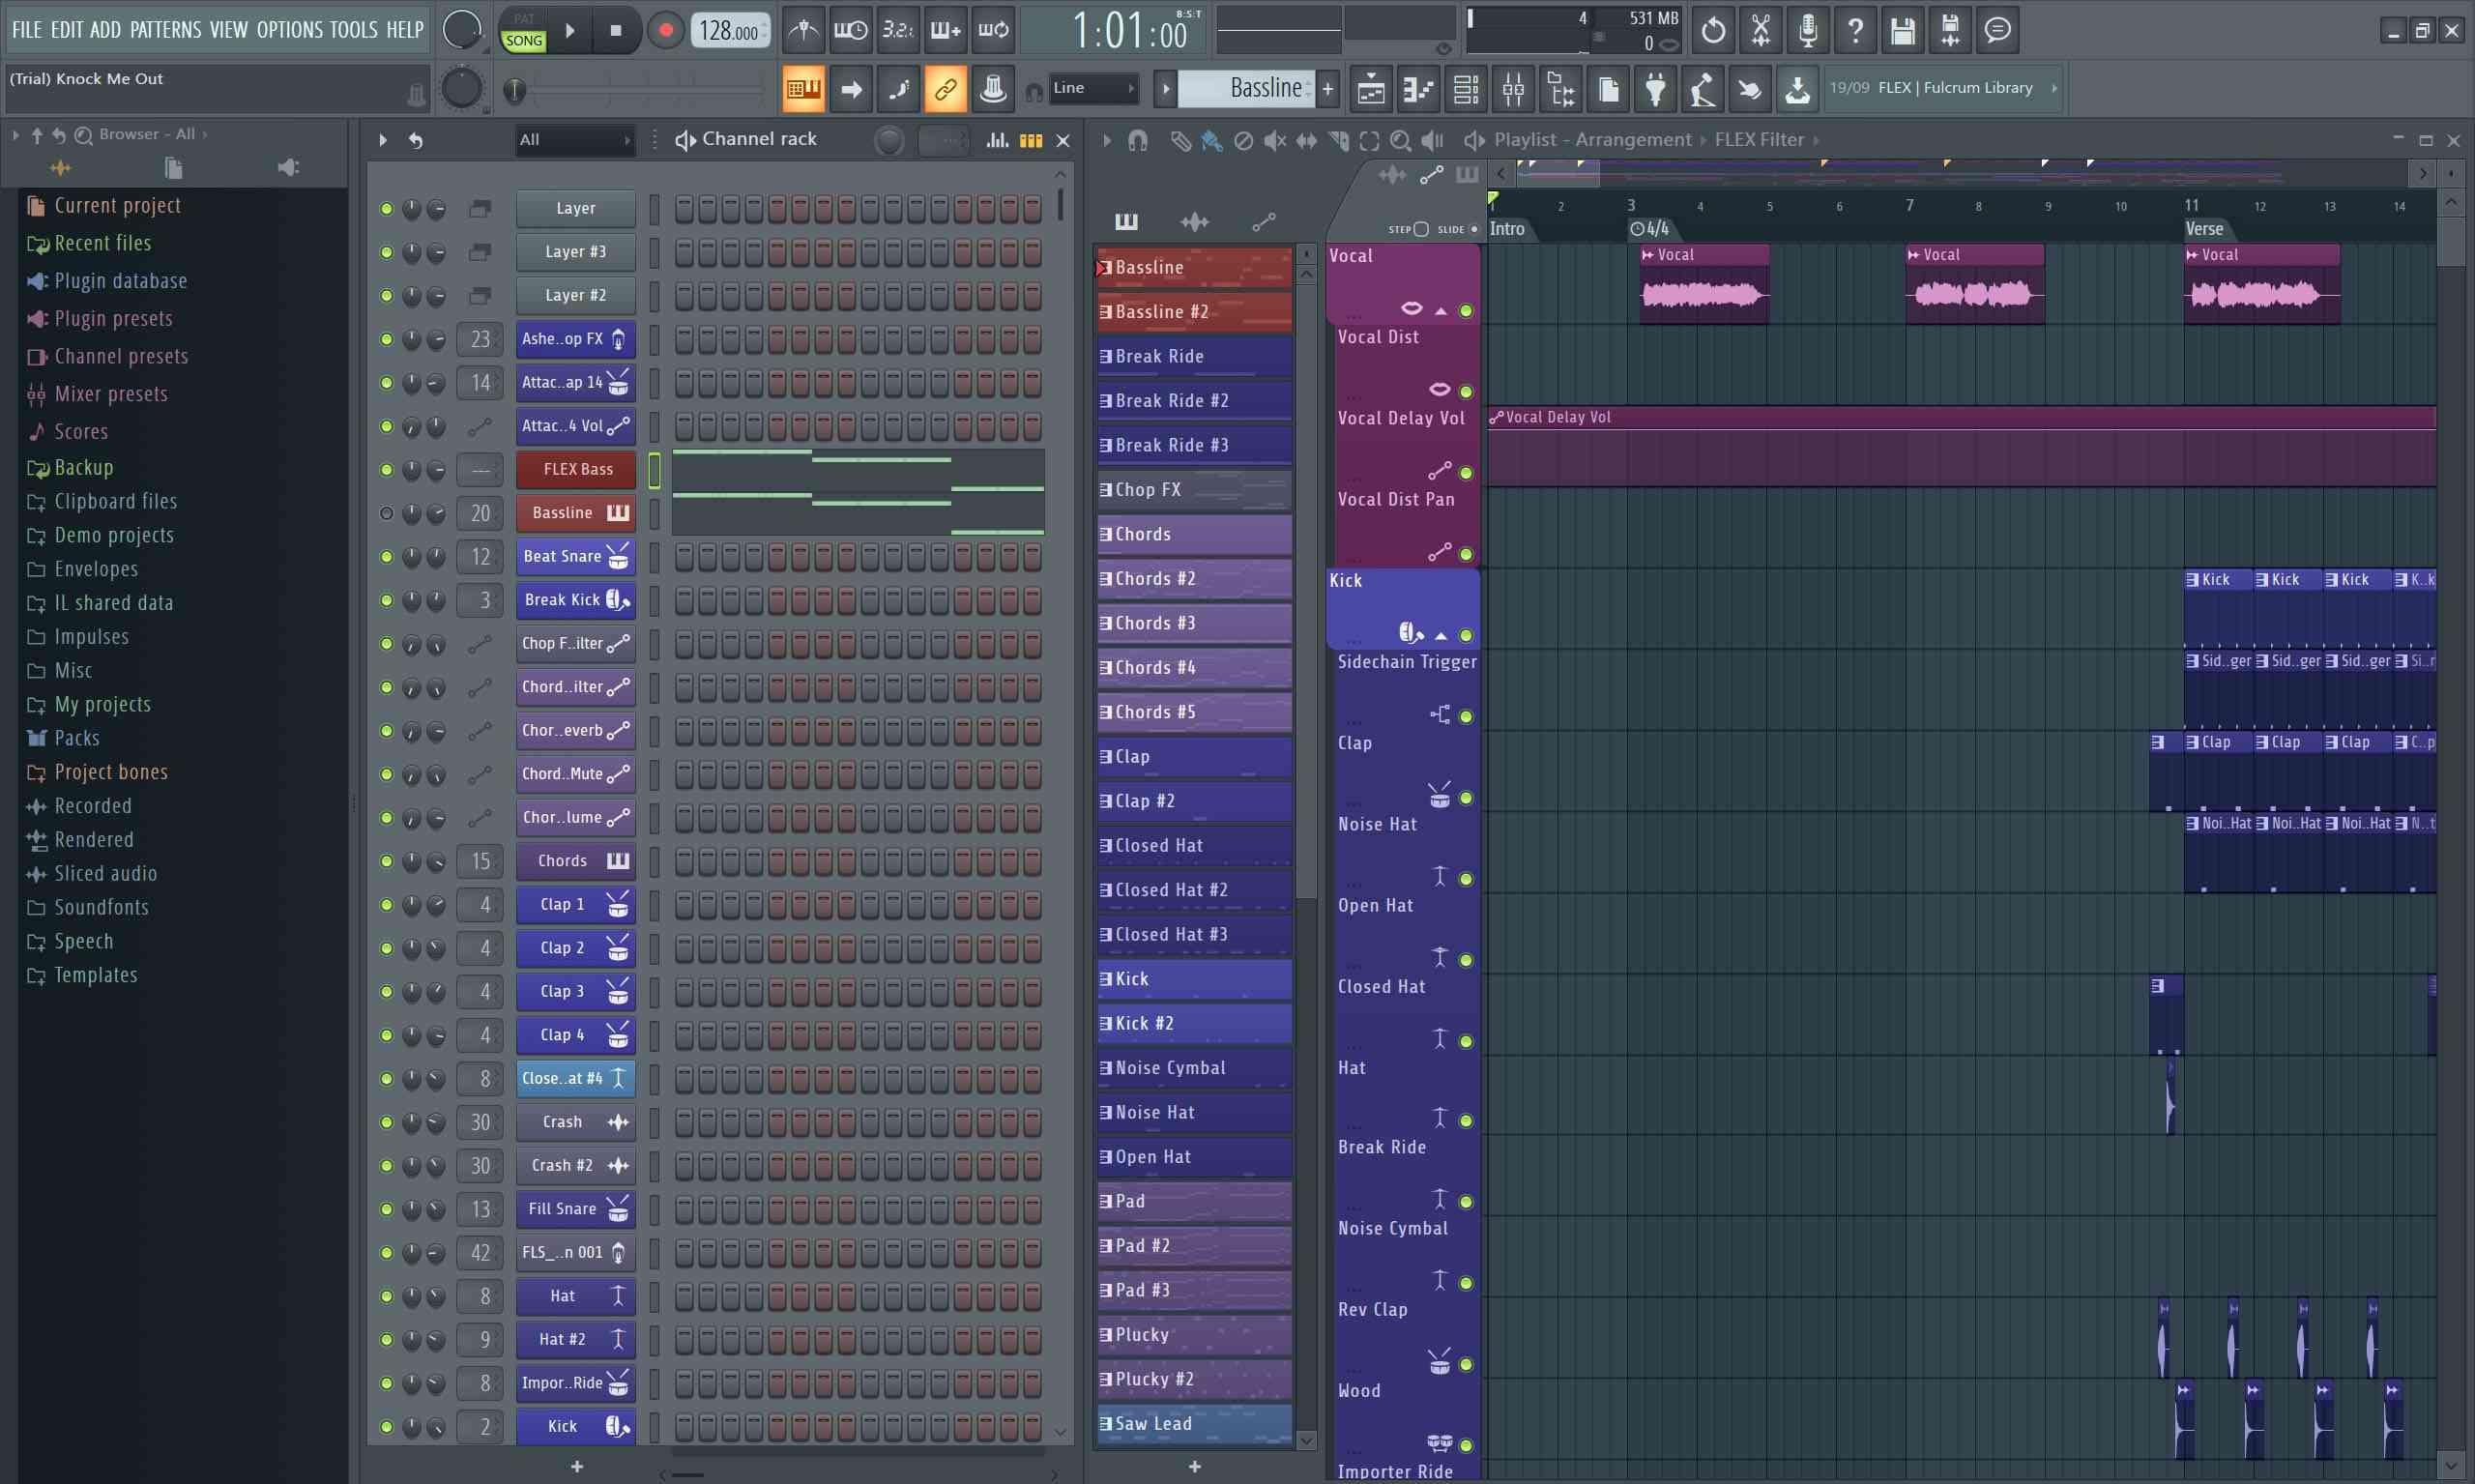 FL Studio 12 Music production app